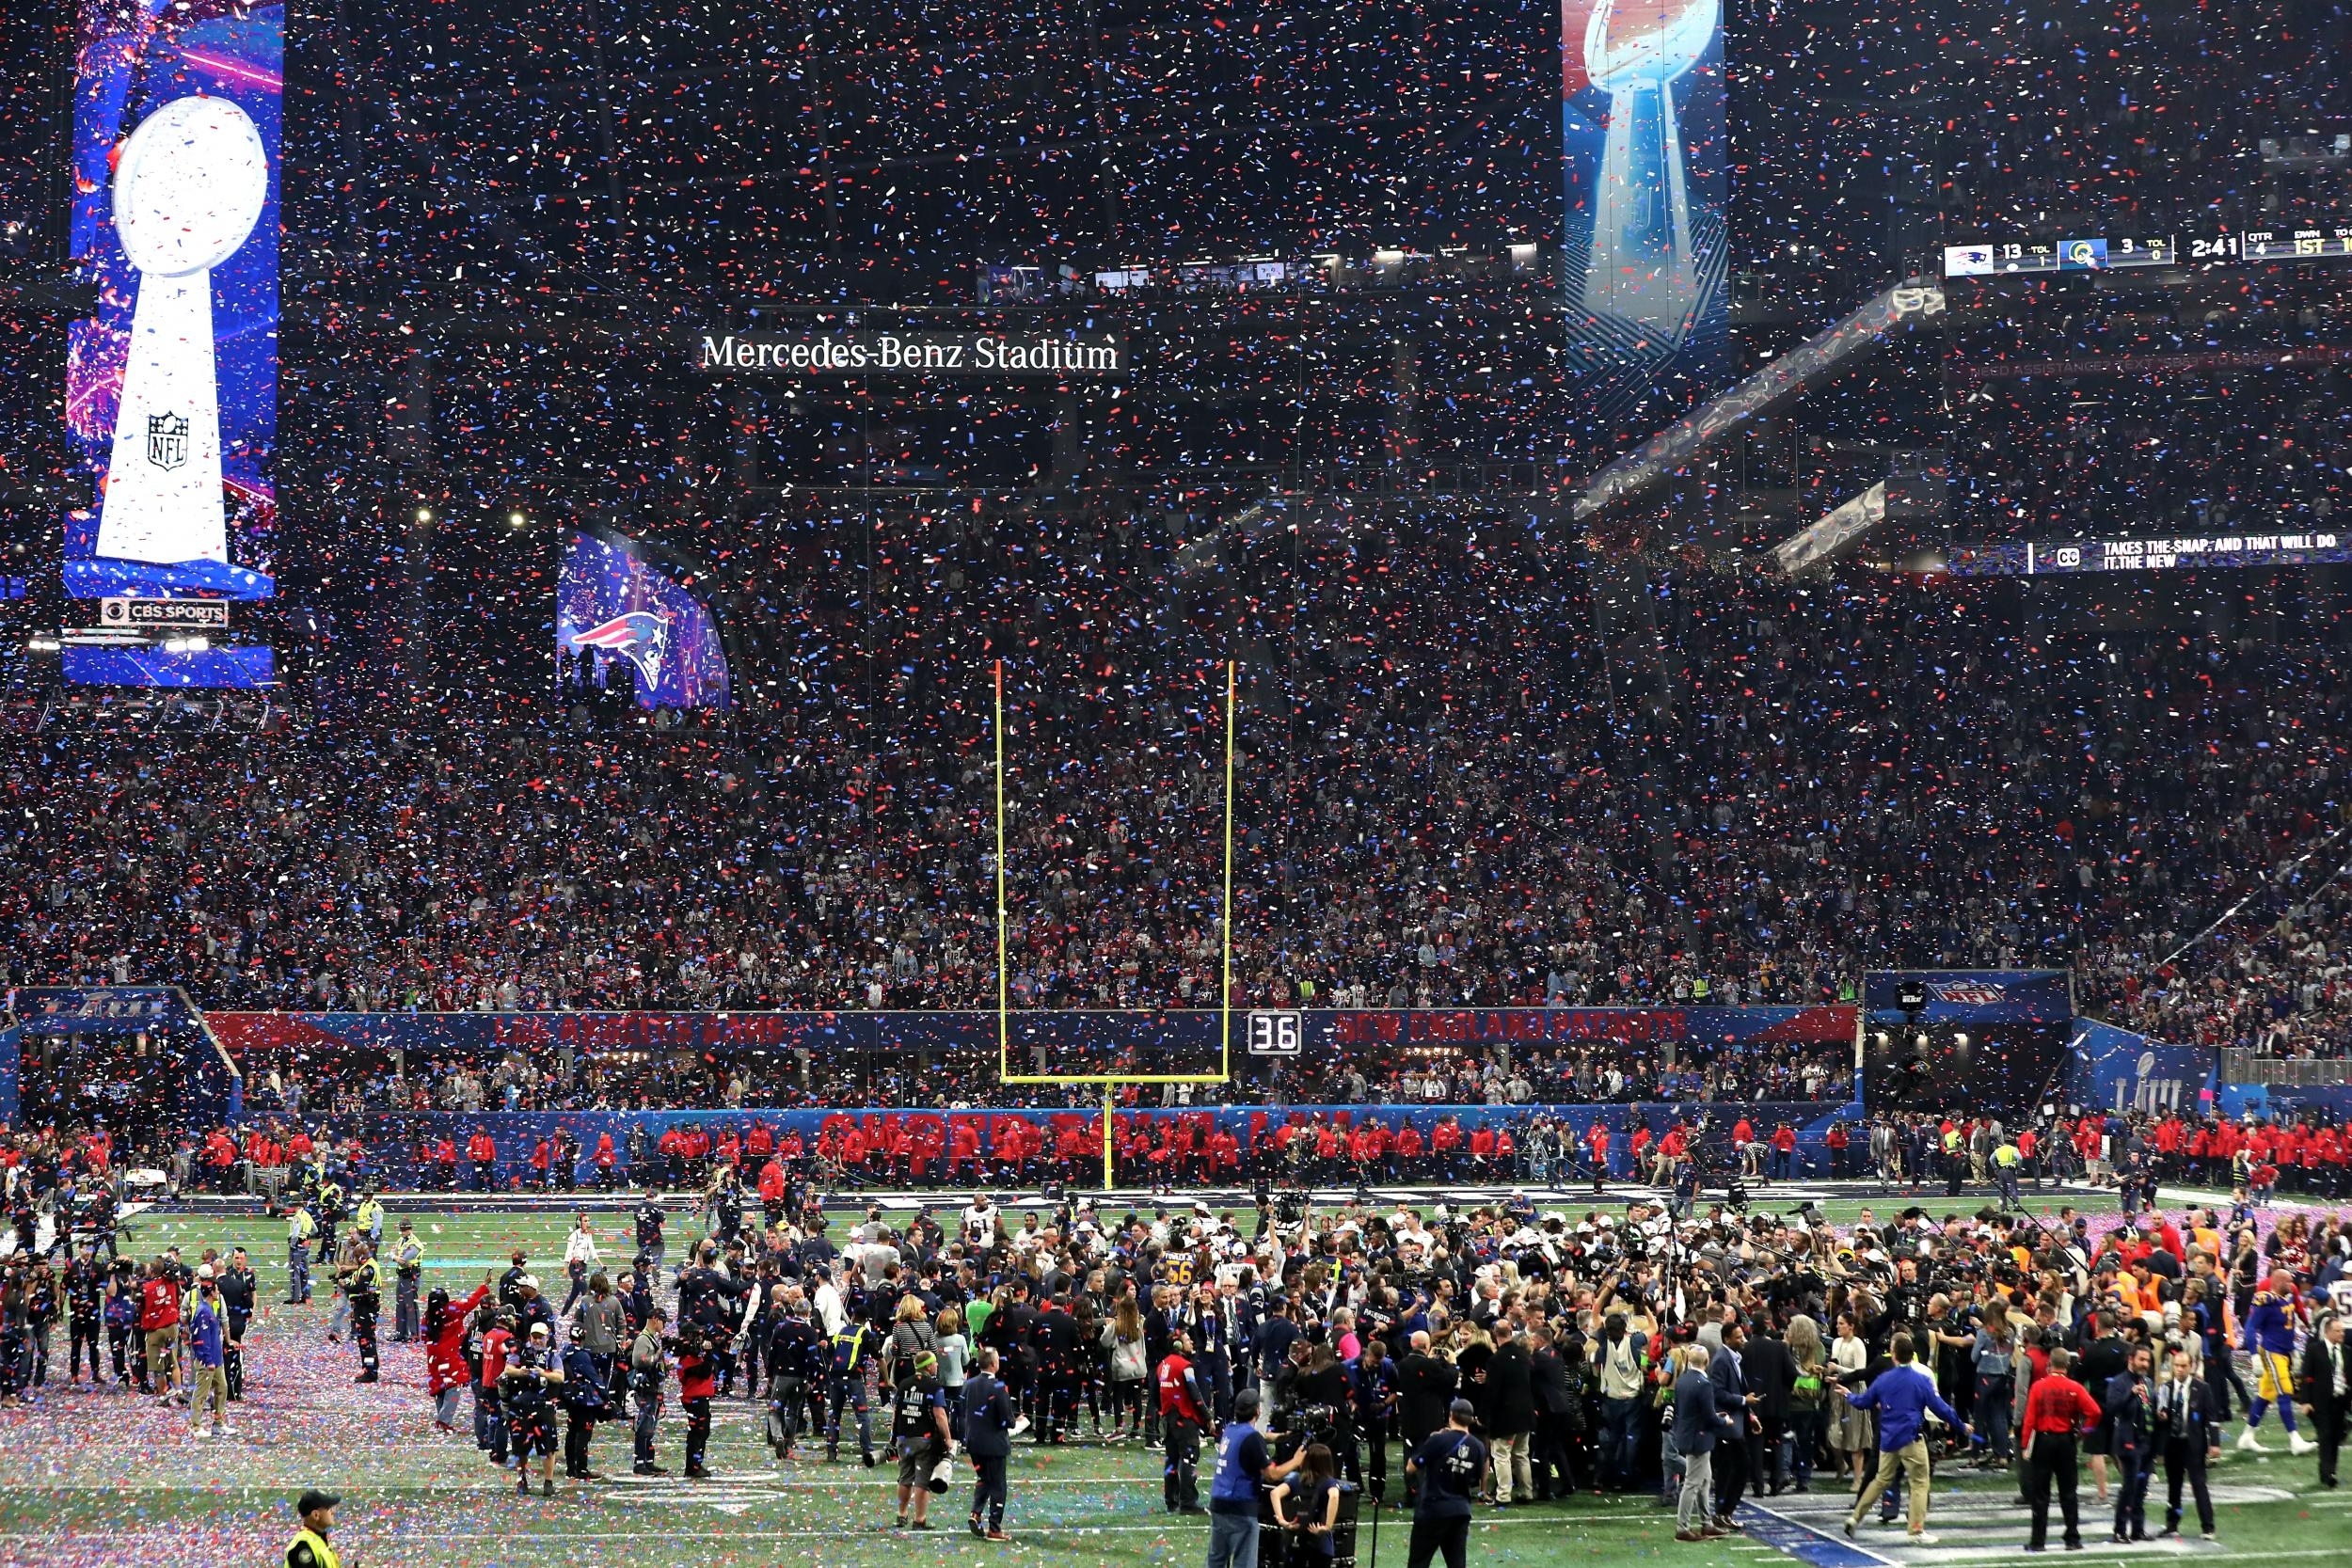 Super Bowl 2019 Attendance: La Rams Vs New England Patriots with regard to Super Bowl Seating Capacity 2019